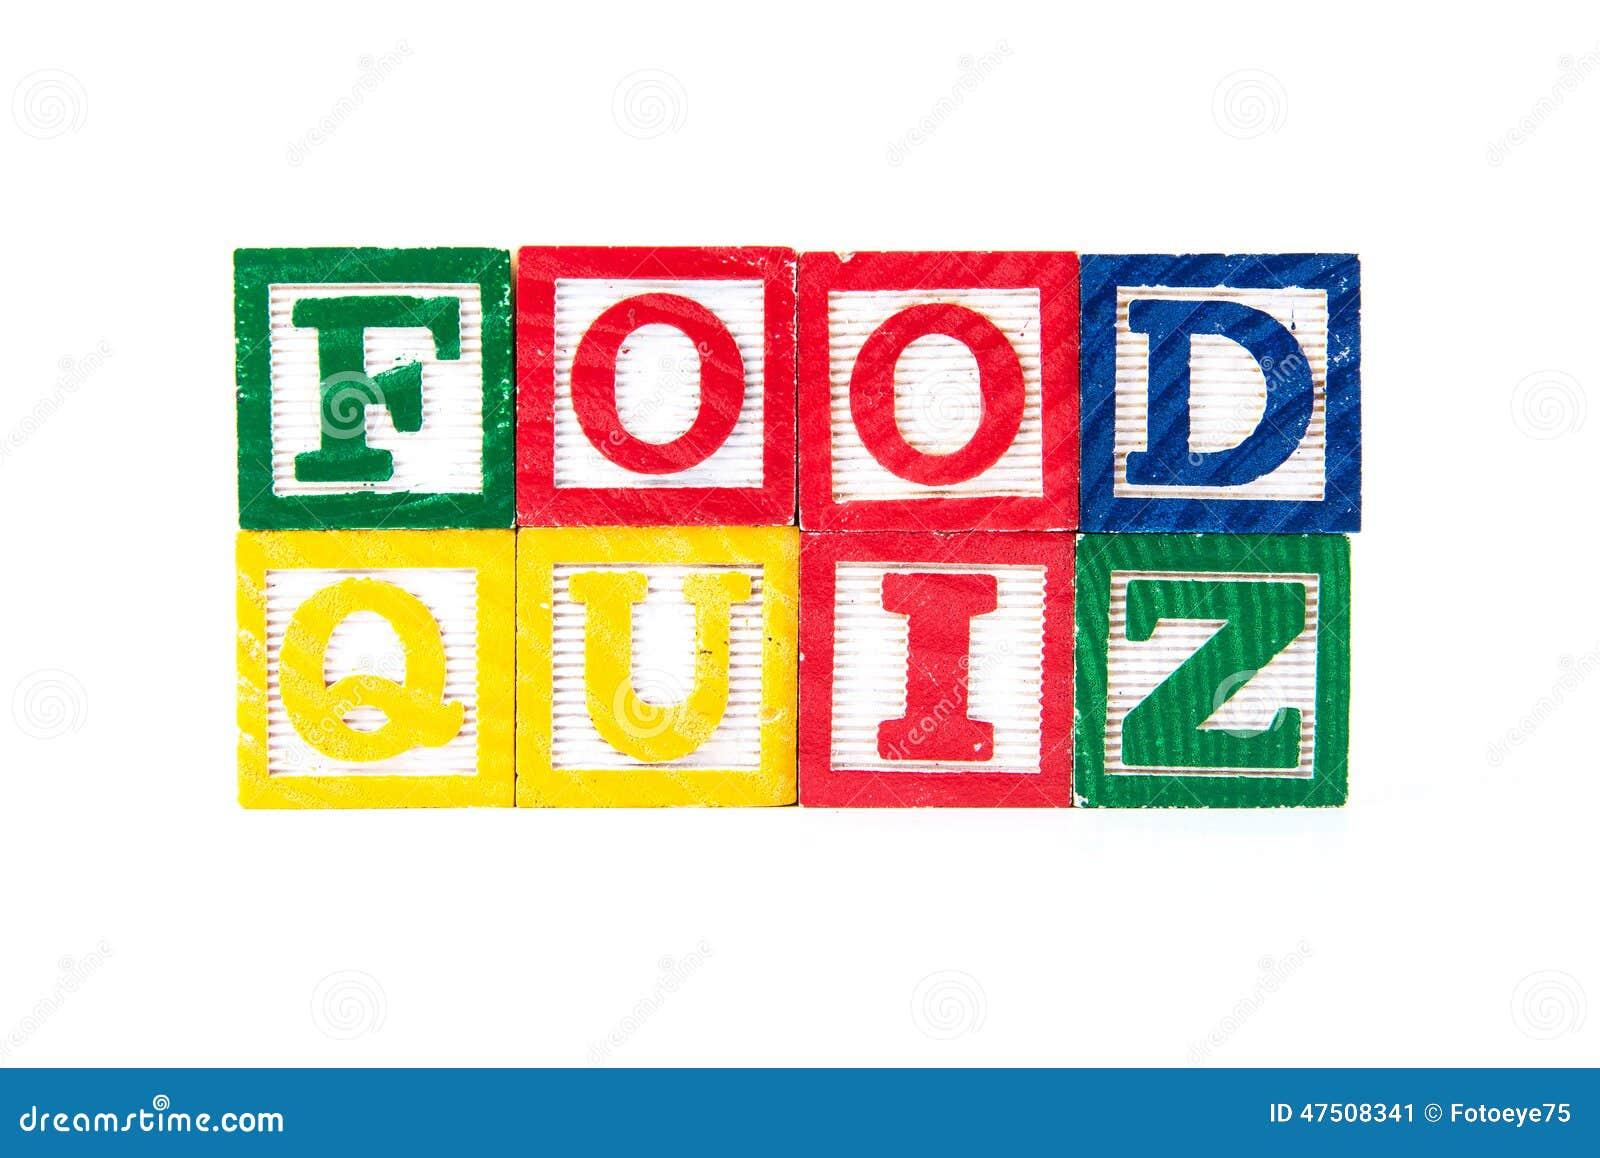 Food quiz alphabet baby blocks on white stock image for Cuisine quiz